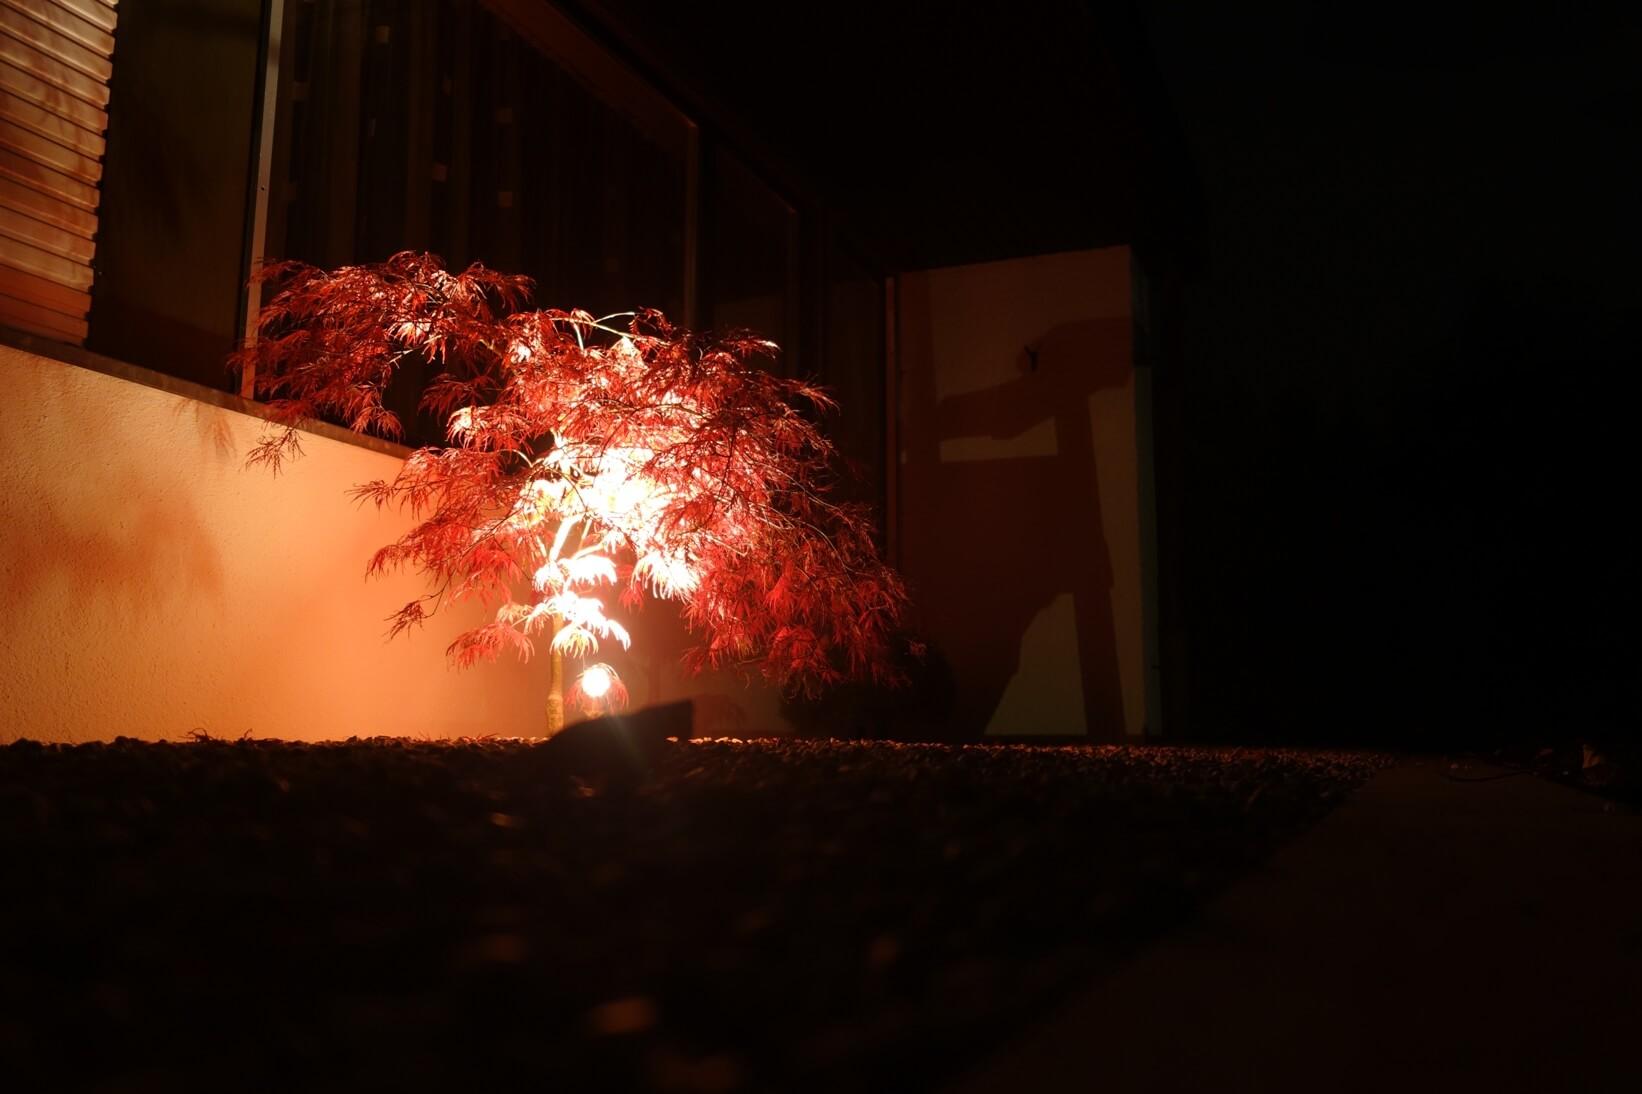 eclairage arbre professionnel aellig paysages lampes illuminer paysagiste tavannes tramelan (2)